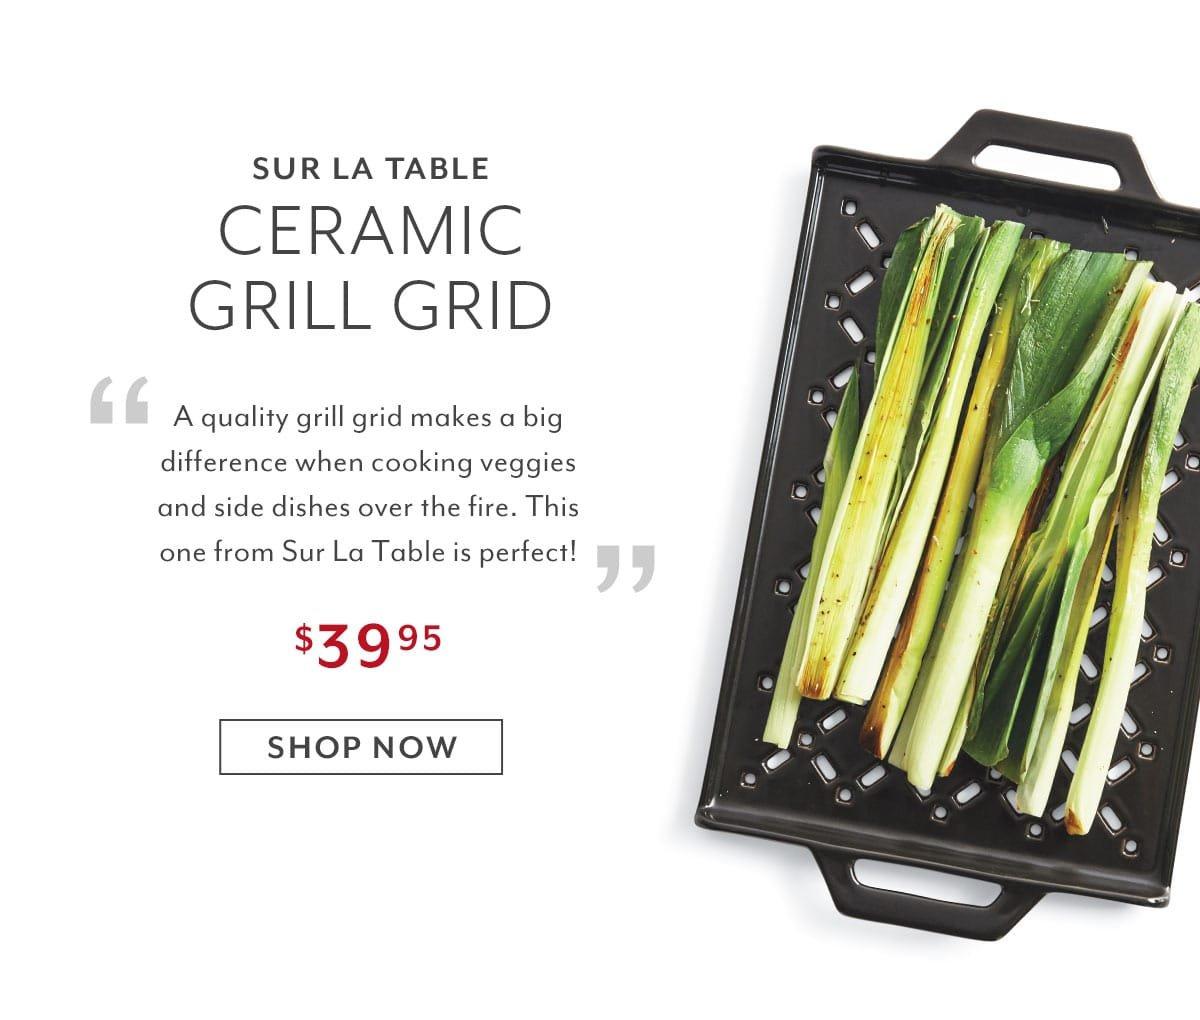 Ceramic Grill Grid